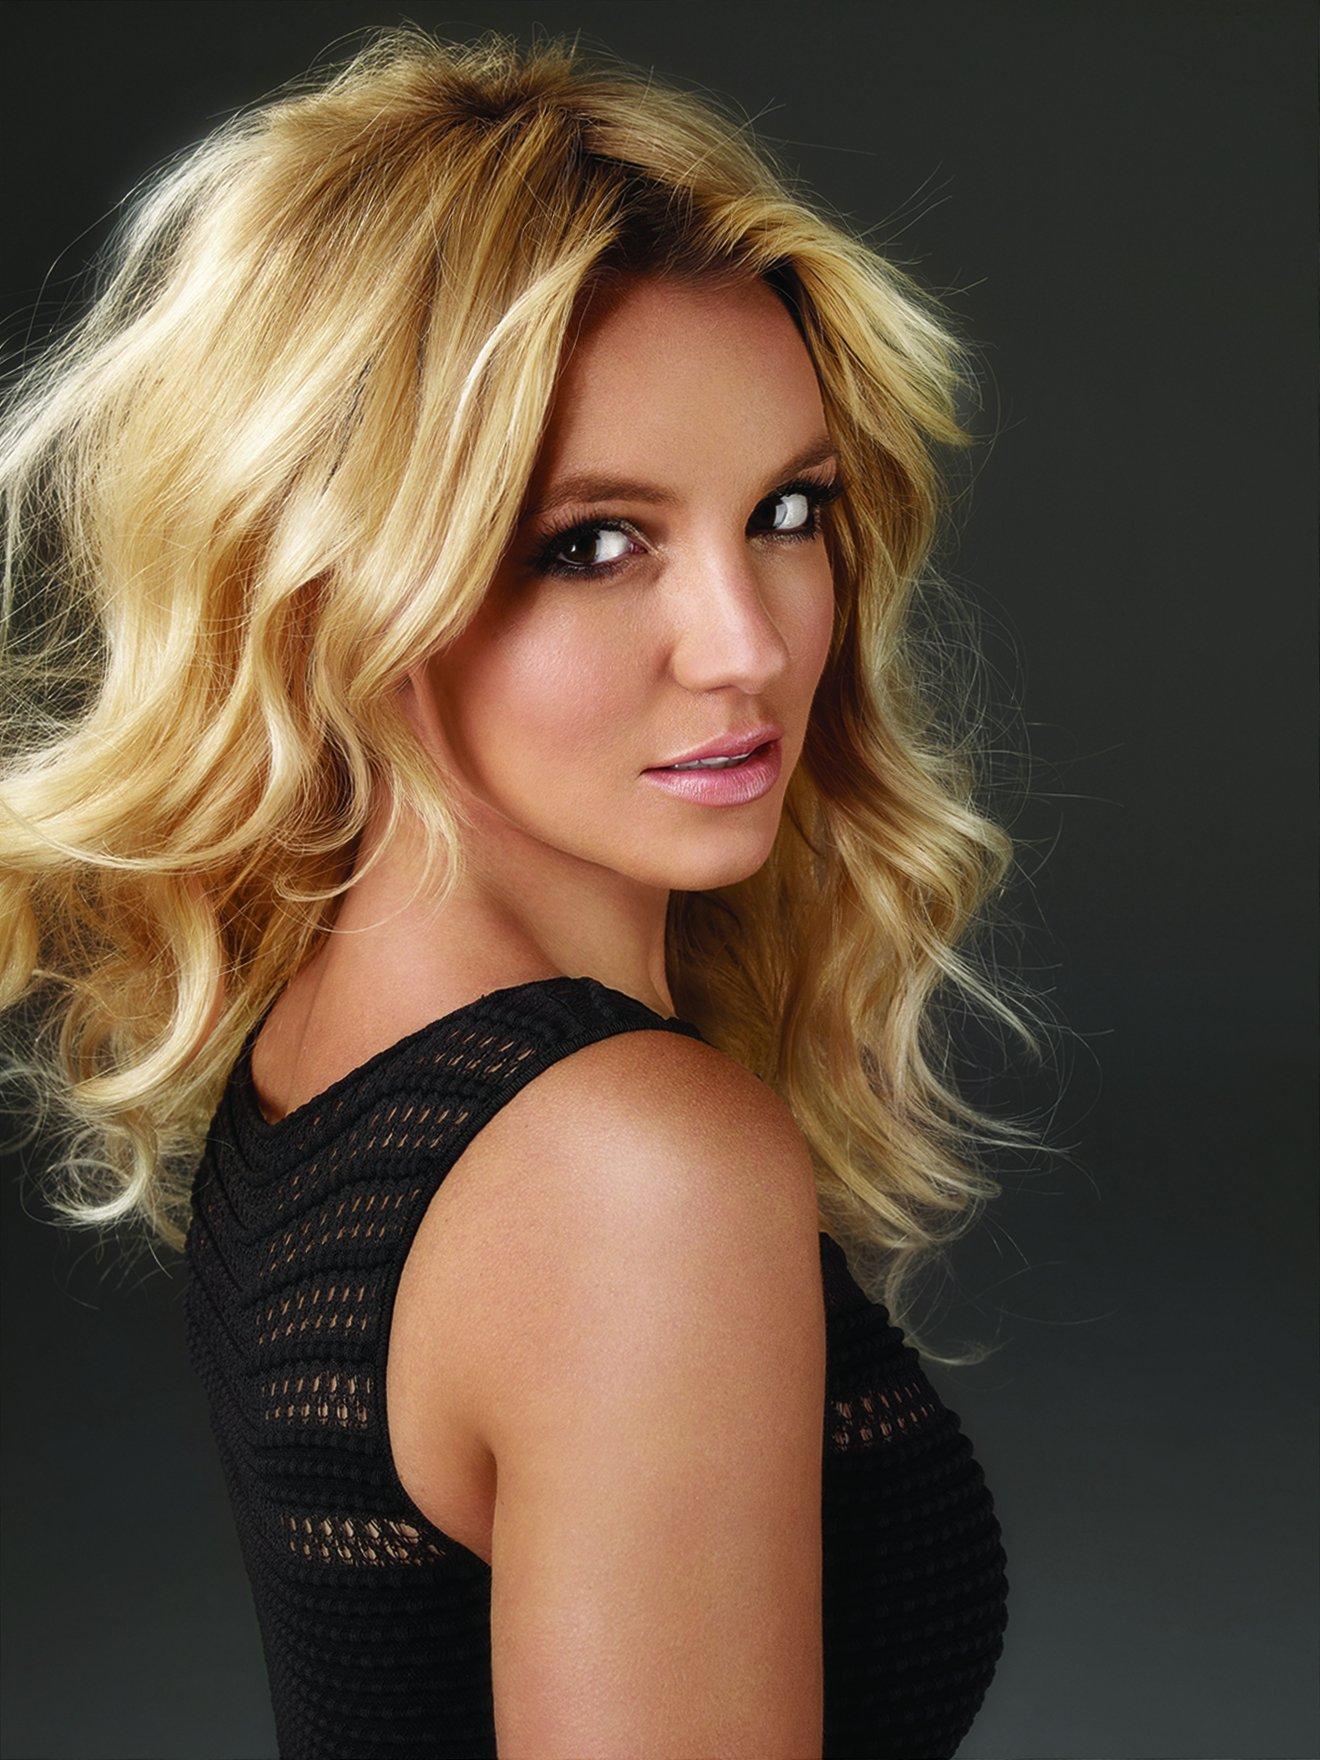 Britney Spears Nude Photos Finally